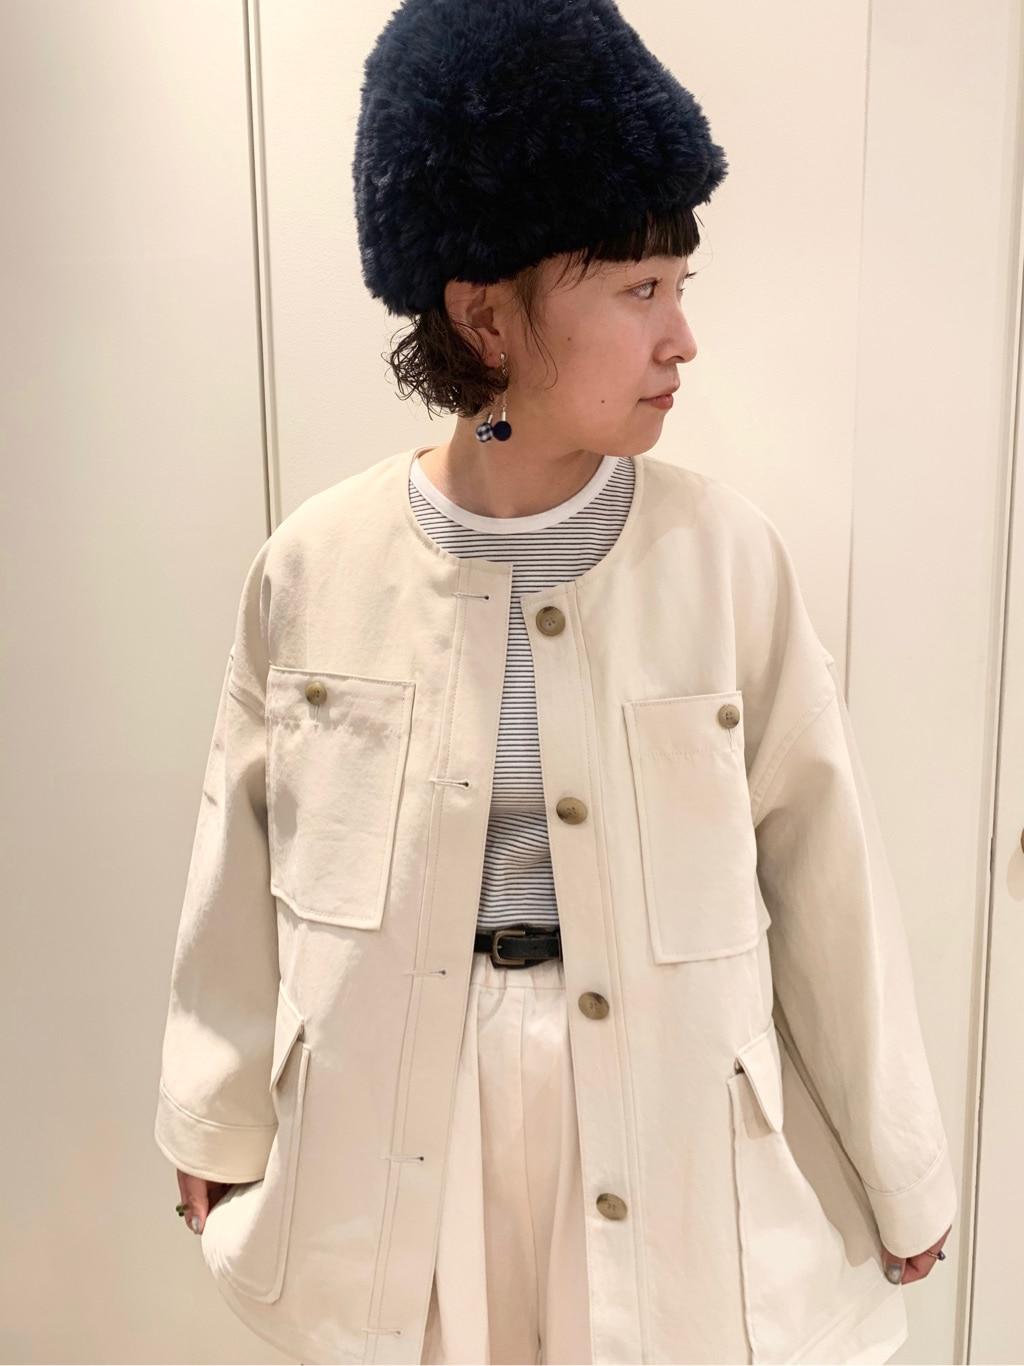 bulle de savon 新宿ミロード 身長:159cm 2020.09.11